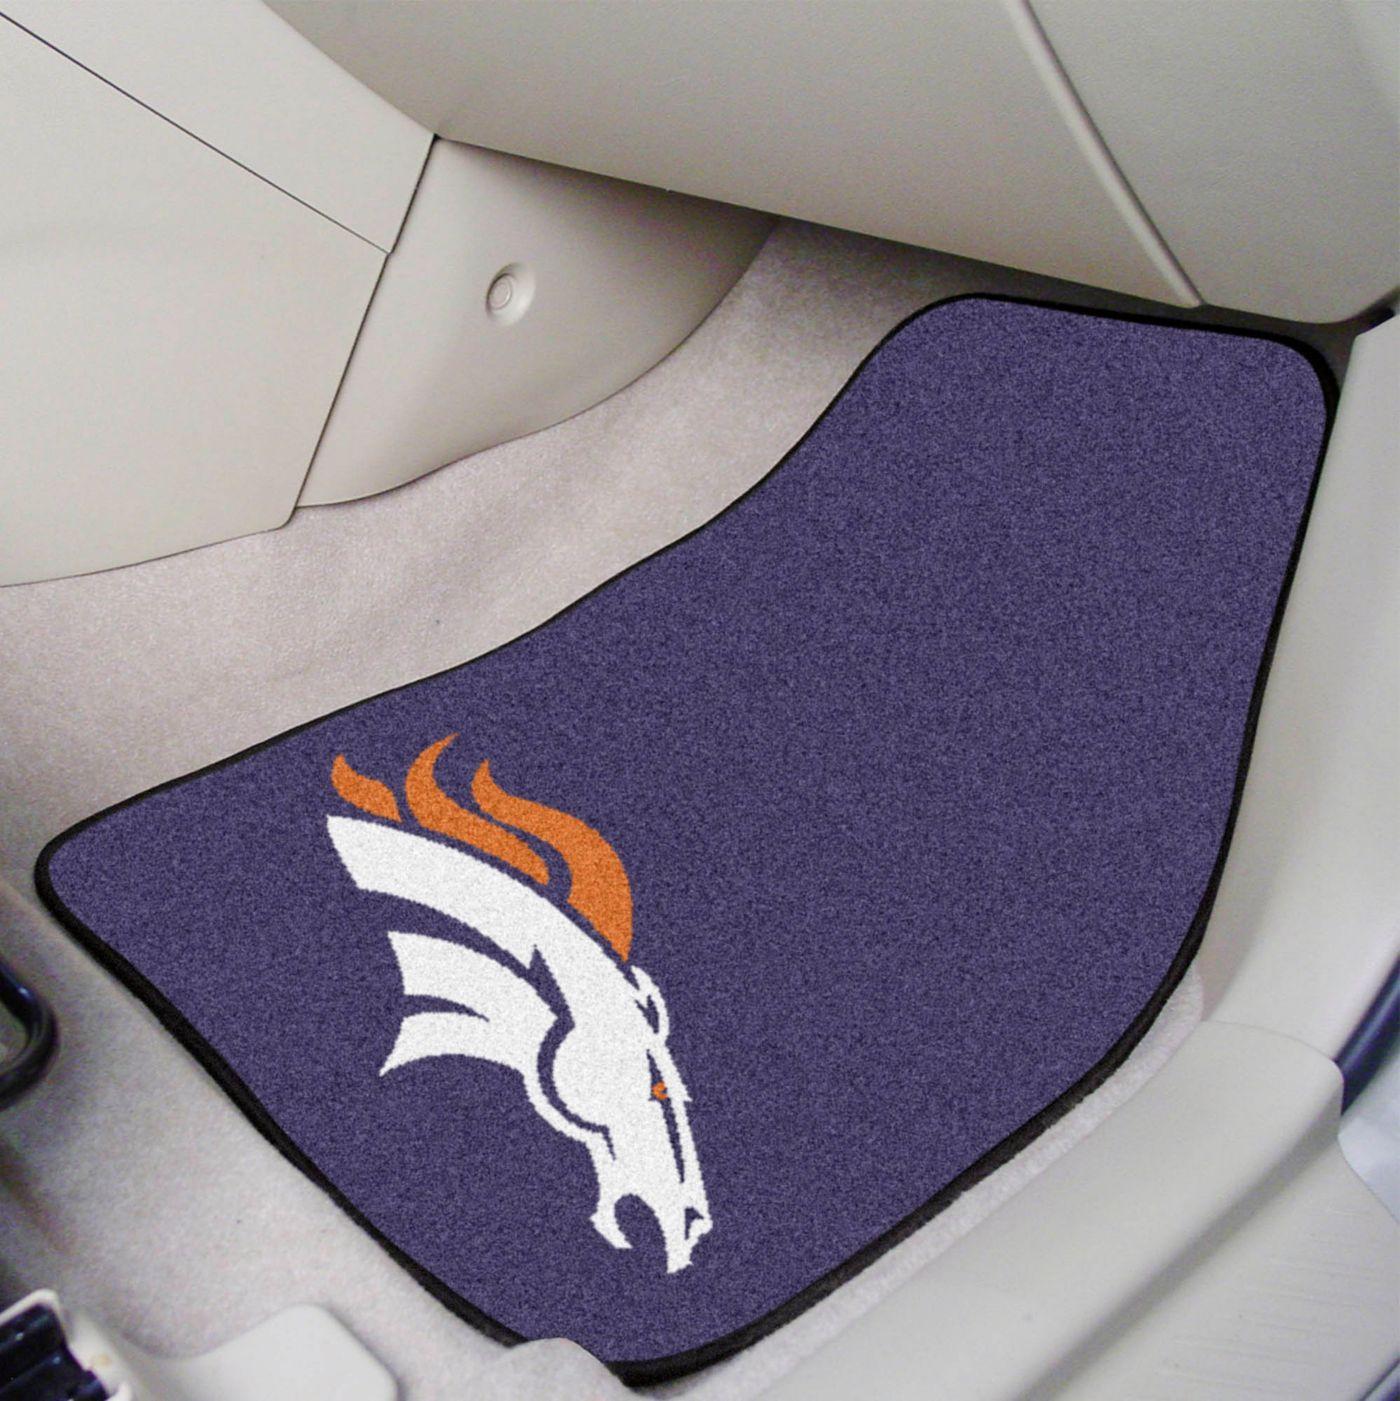 FANMATS Denver Broncos 2-Piece Printed Carpet Car Mat Set